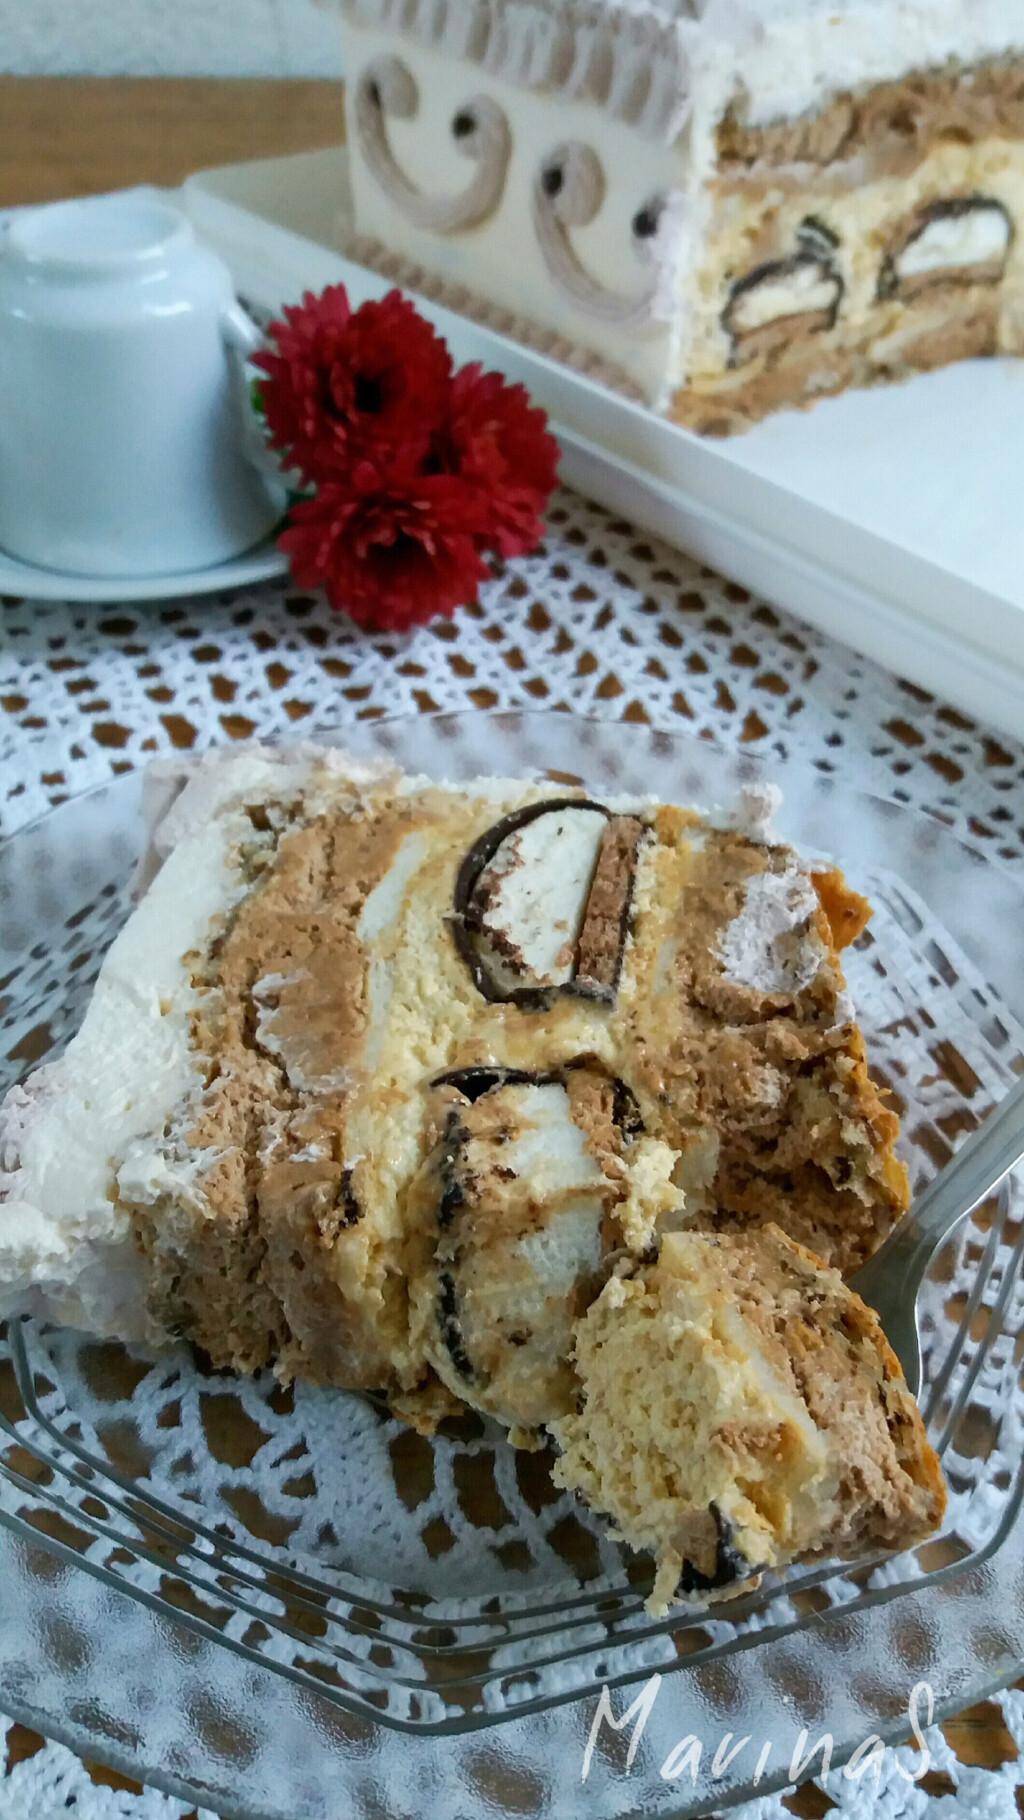 Super-torta-2